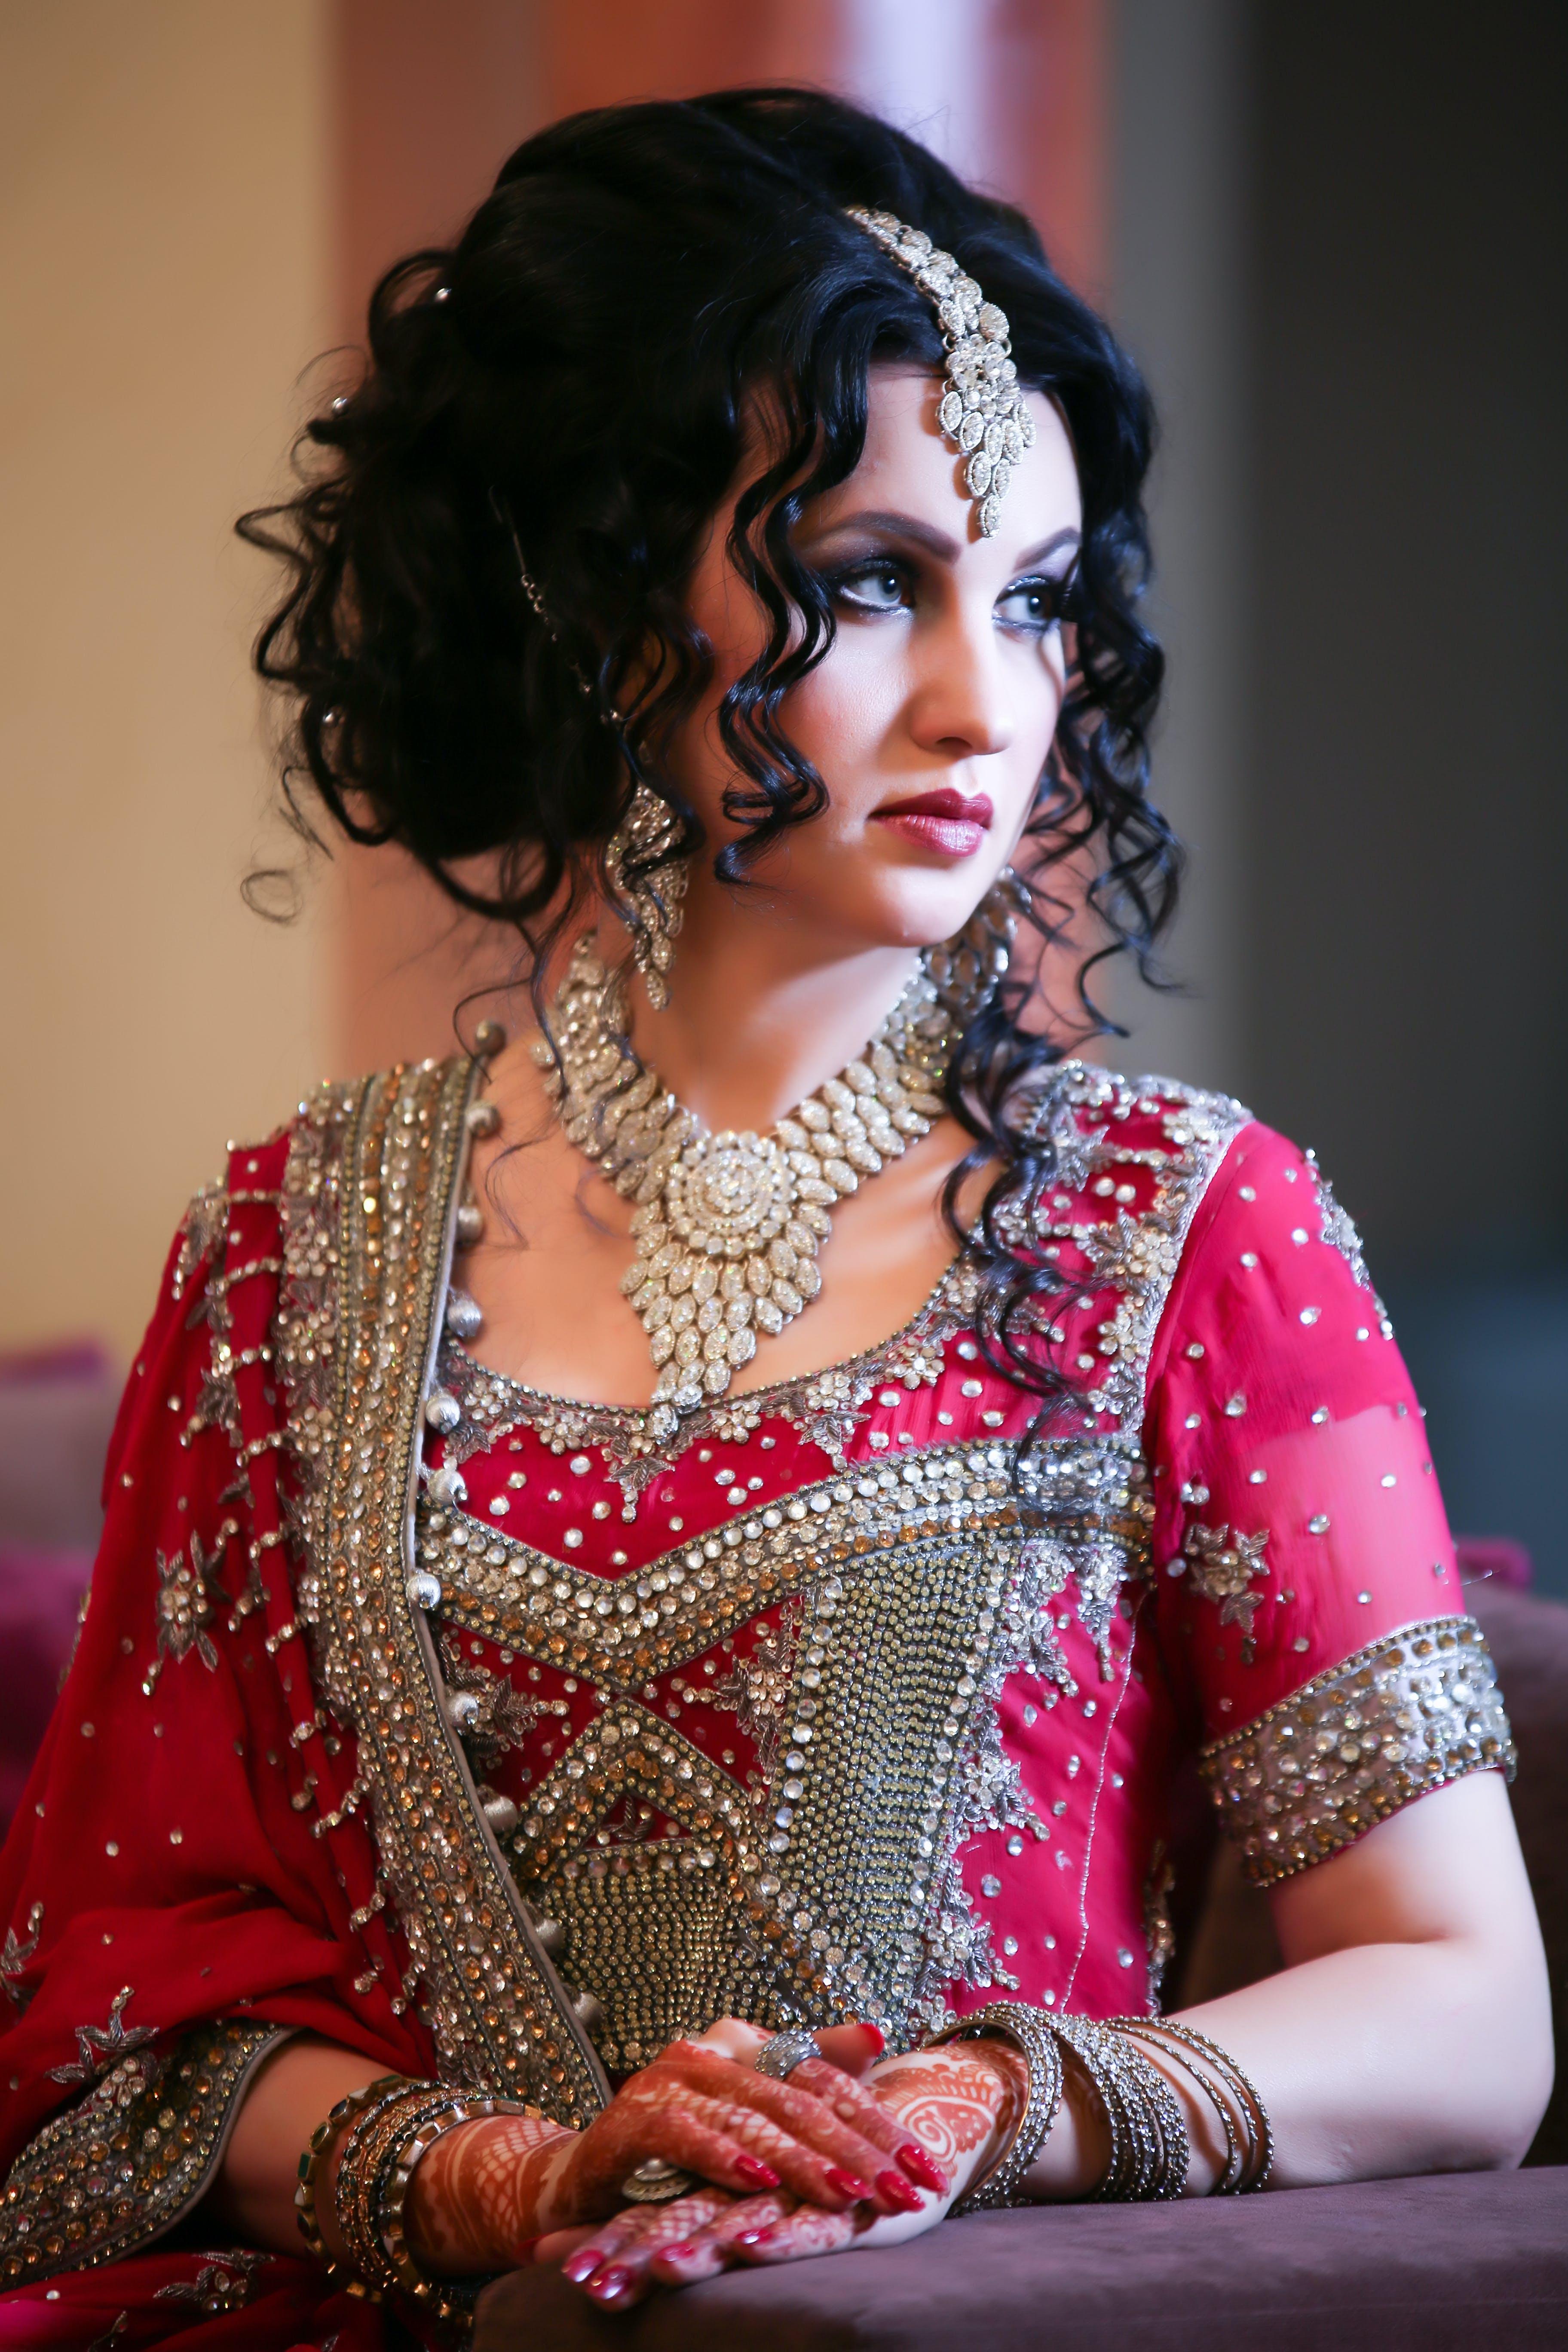 Free stock photo of bridal, bride, make up, wedding dress